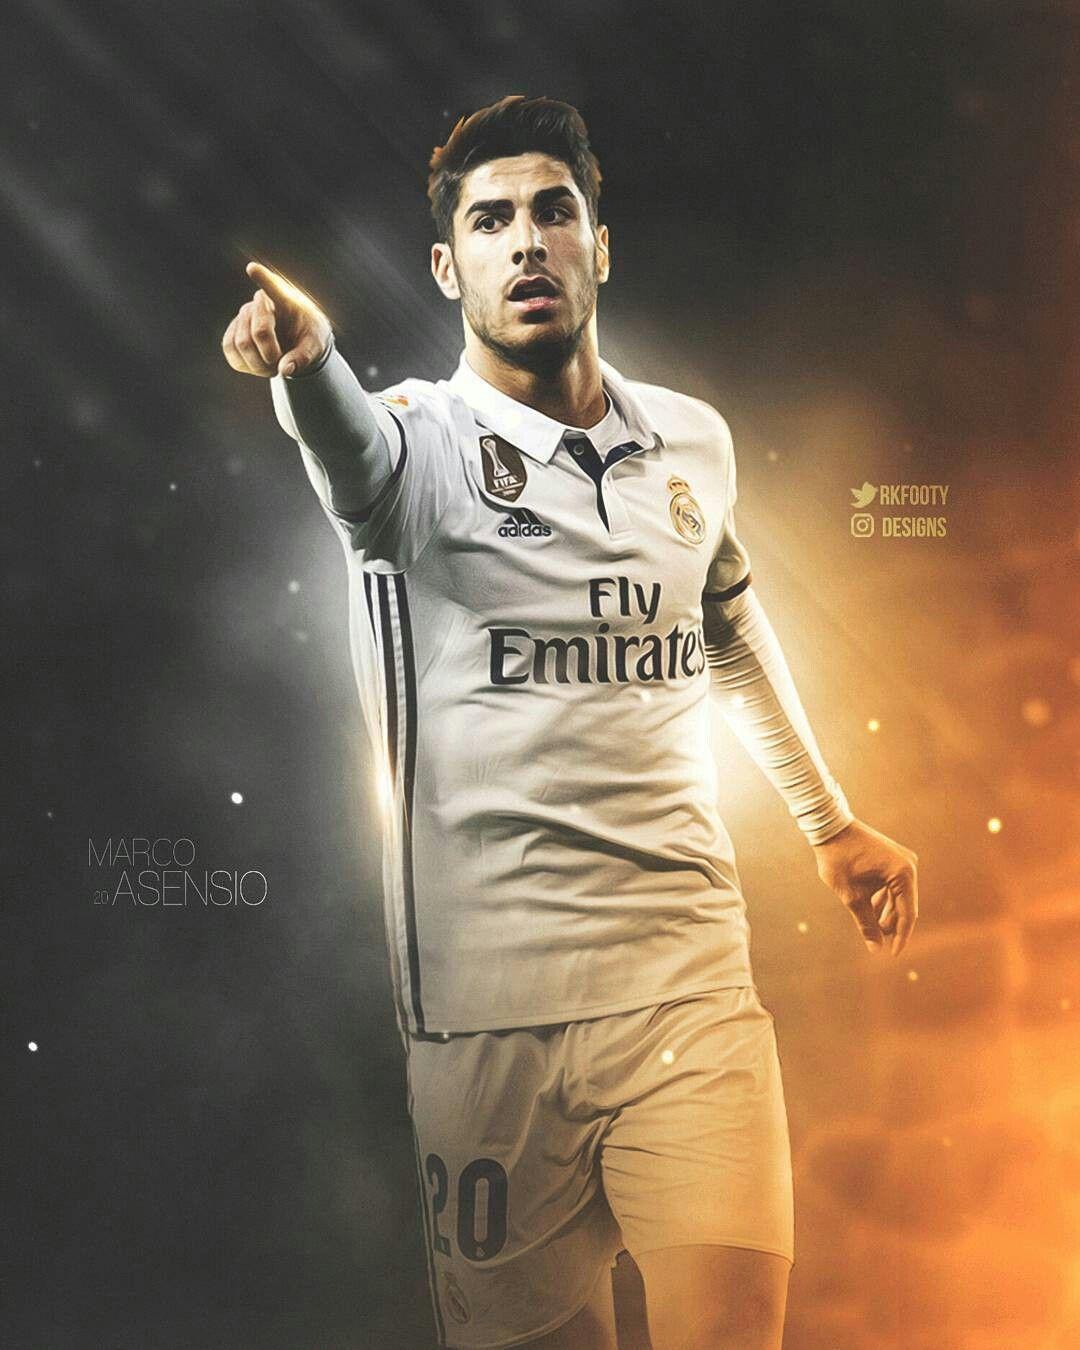 Real Madrid Wallpaper Full Hd Marco Asensio ⚽real Madrid⚽ Pinterest Real Madrid